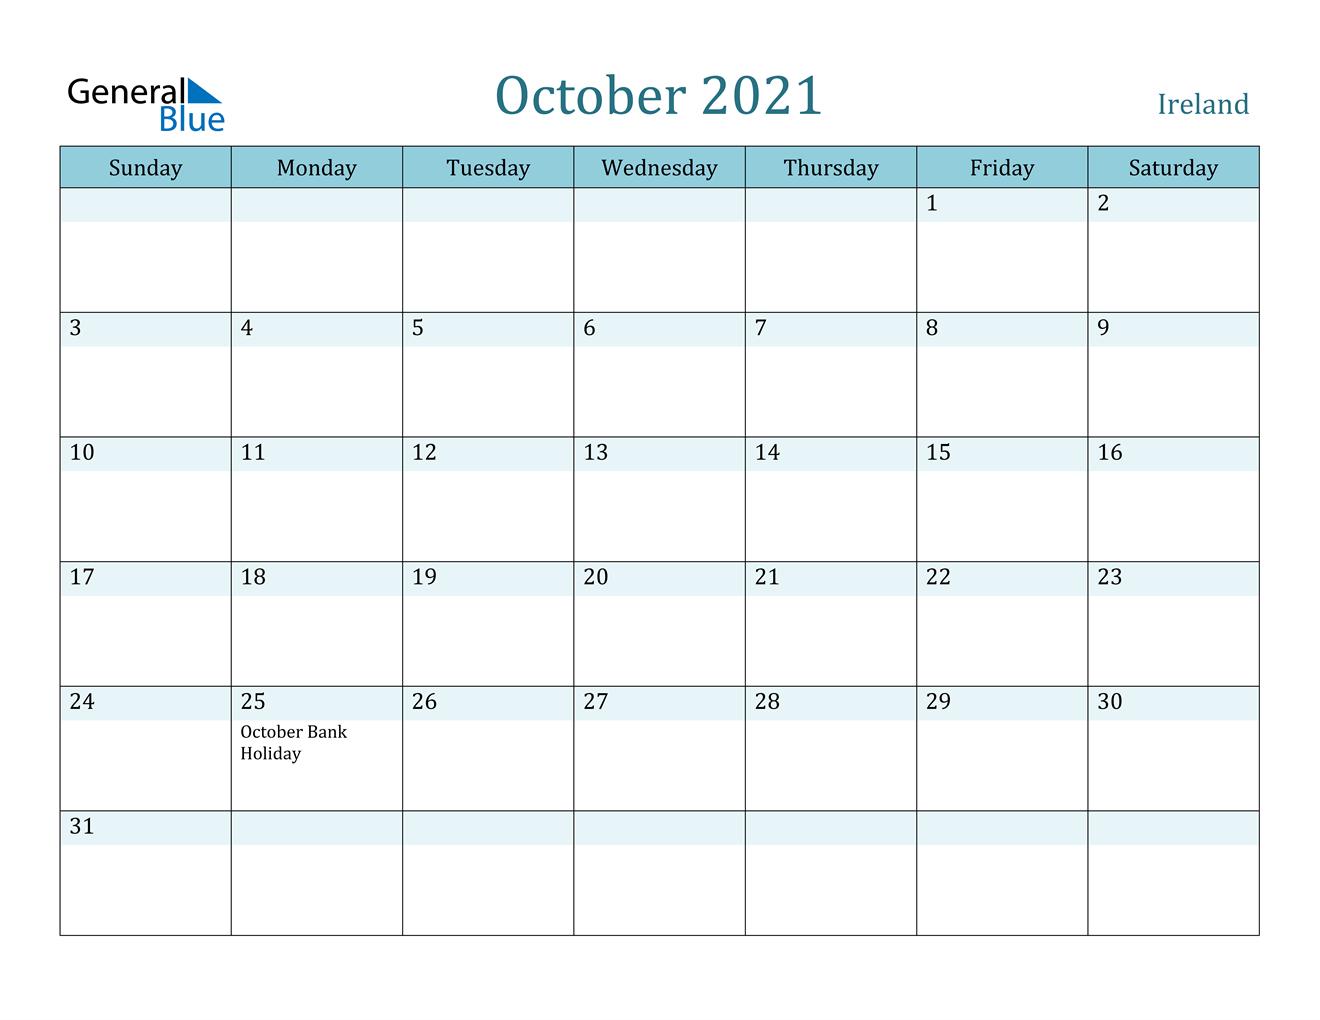 October 2021 Calendar - Ireland